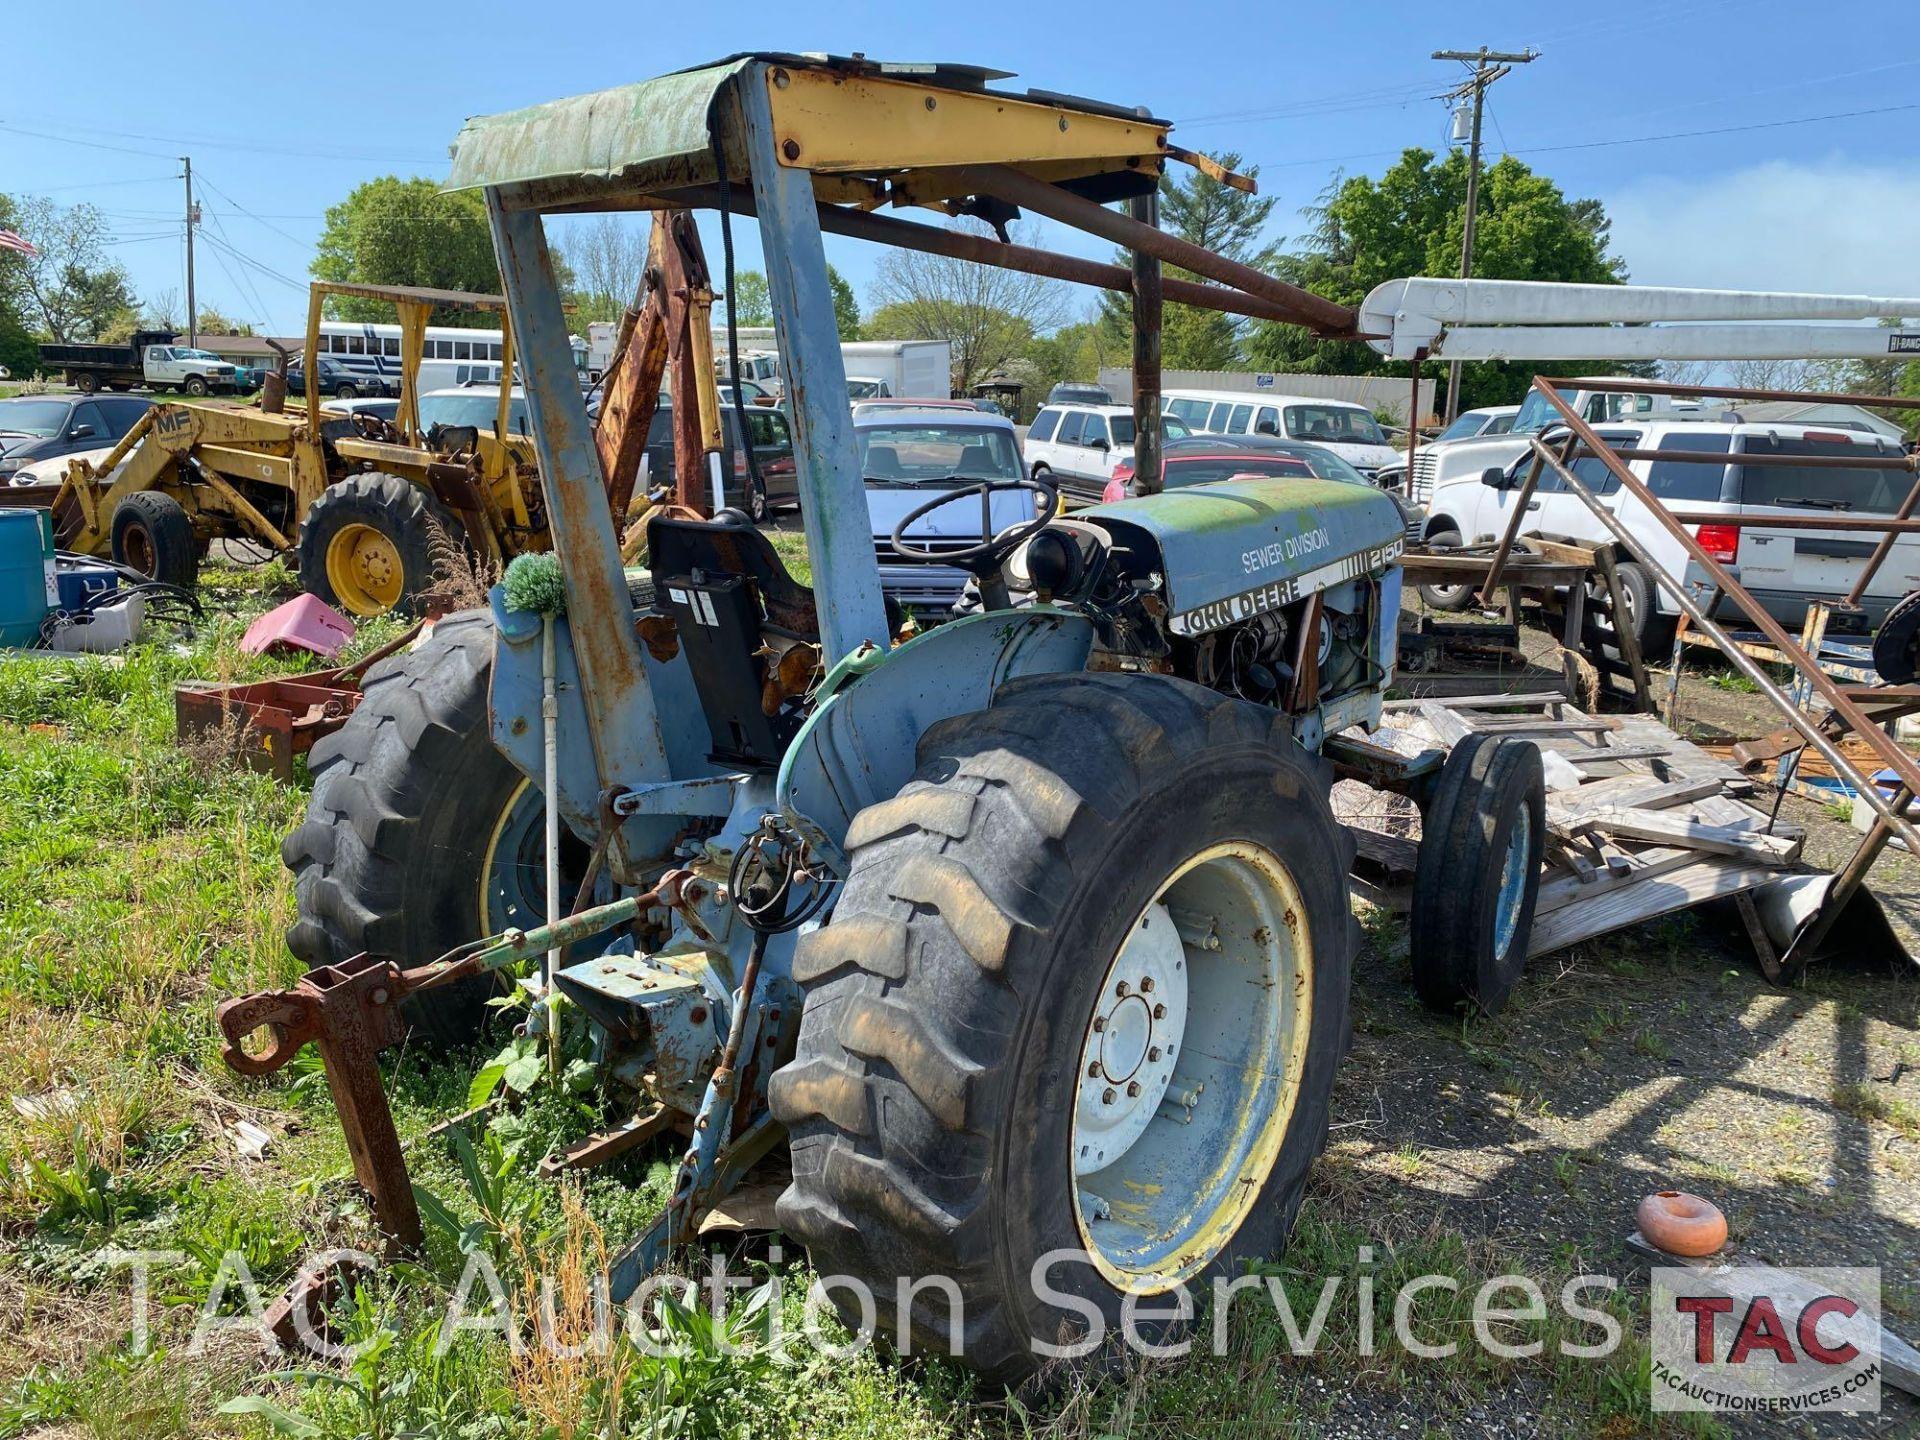 John Deere 2150 Farm Tractor - Image 4 of 34